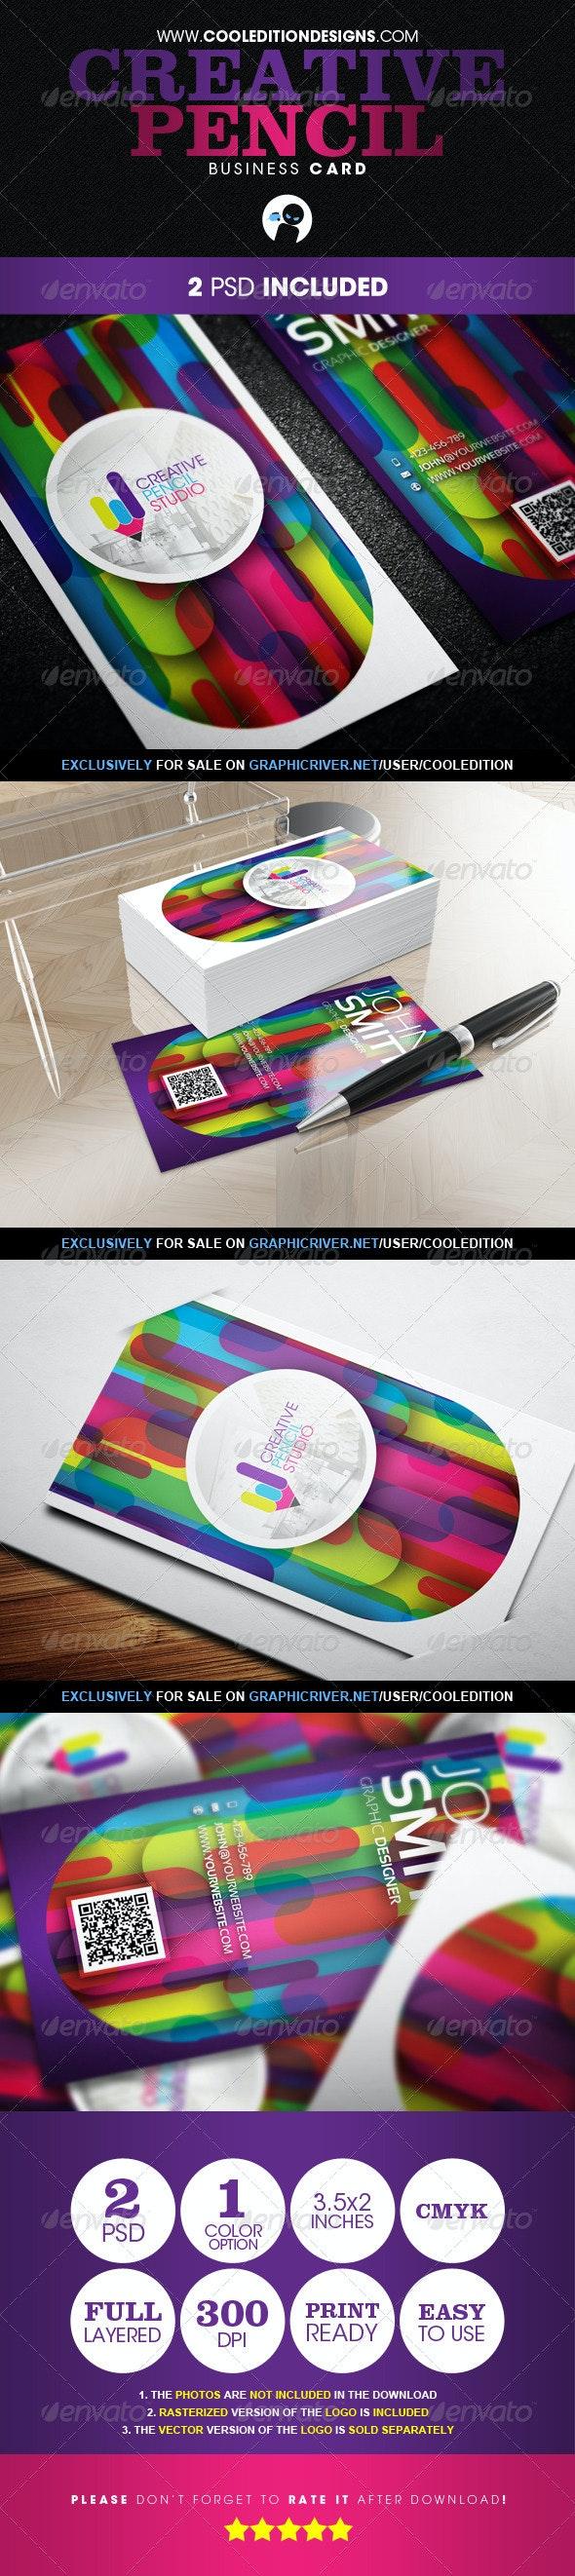 Creative Pencil - Business Card - Creative Business Cards